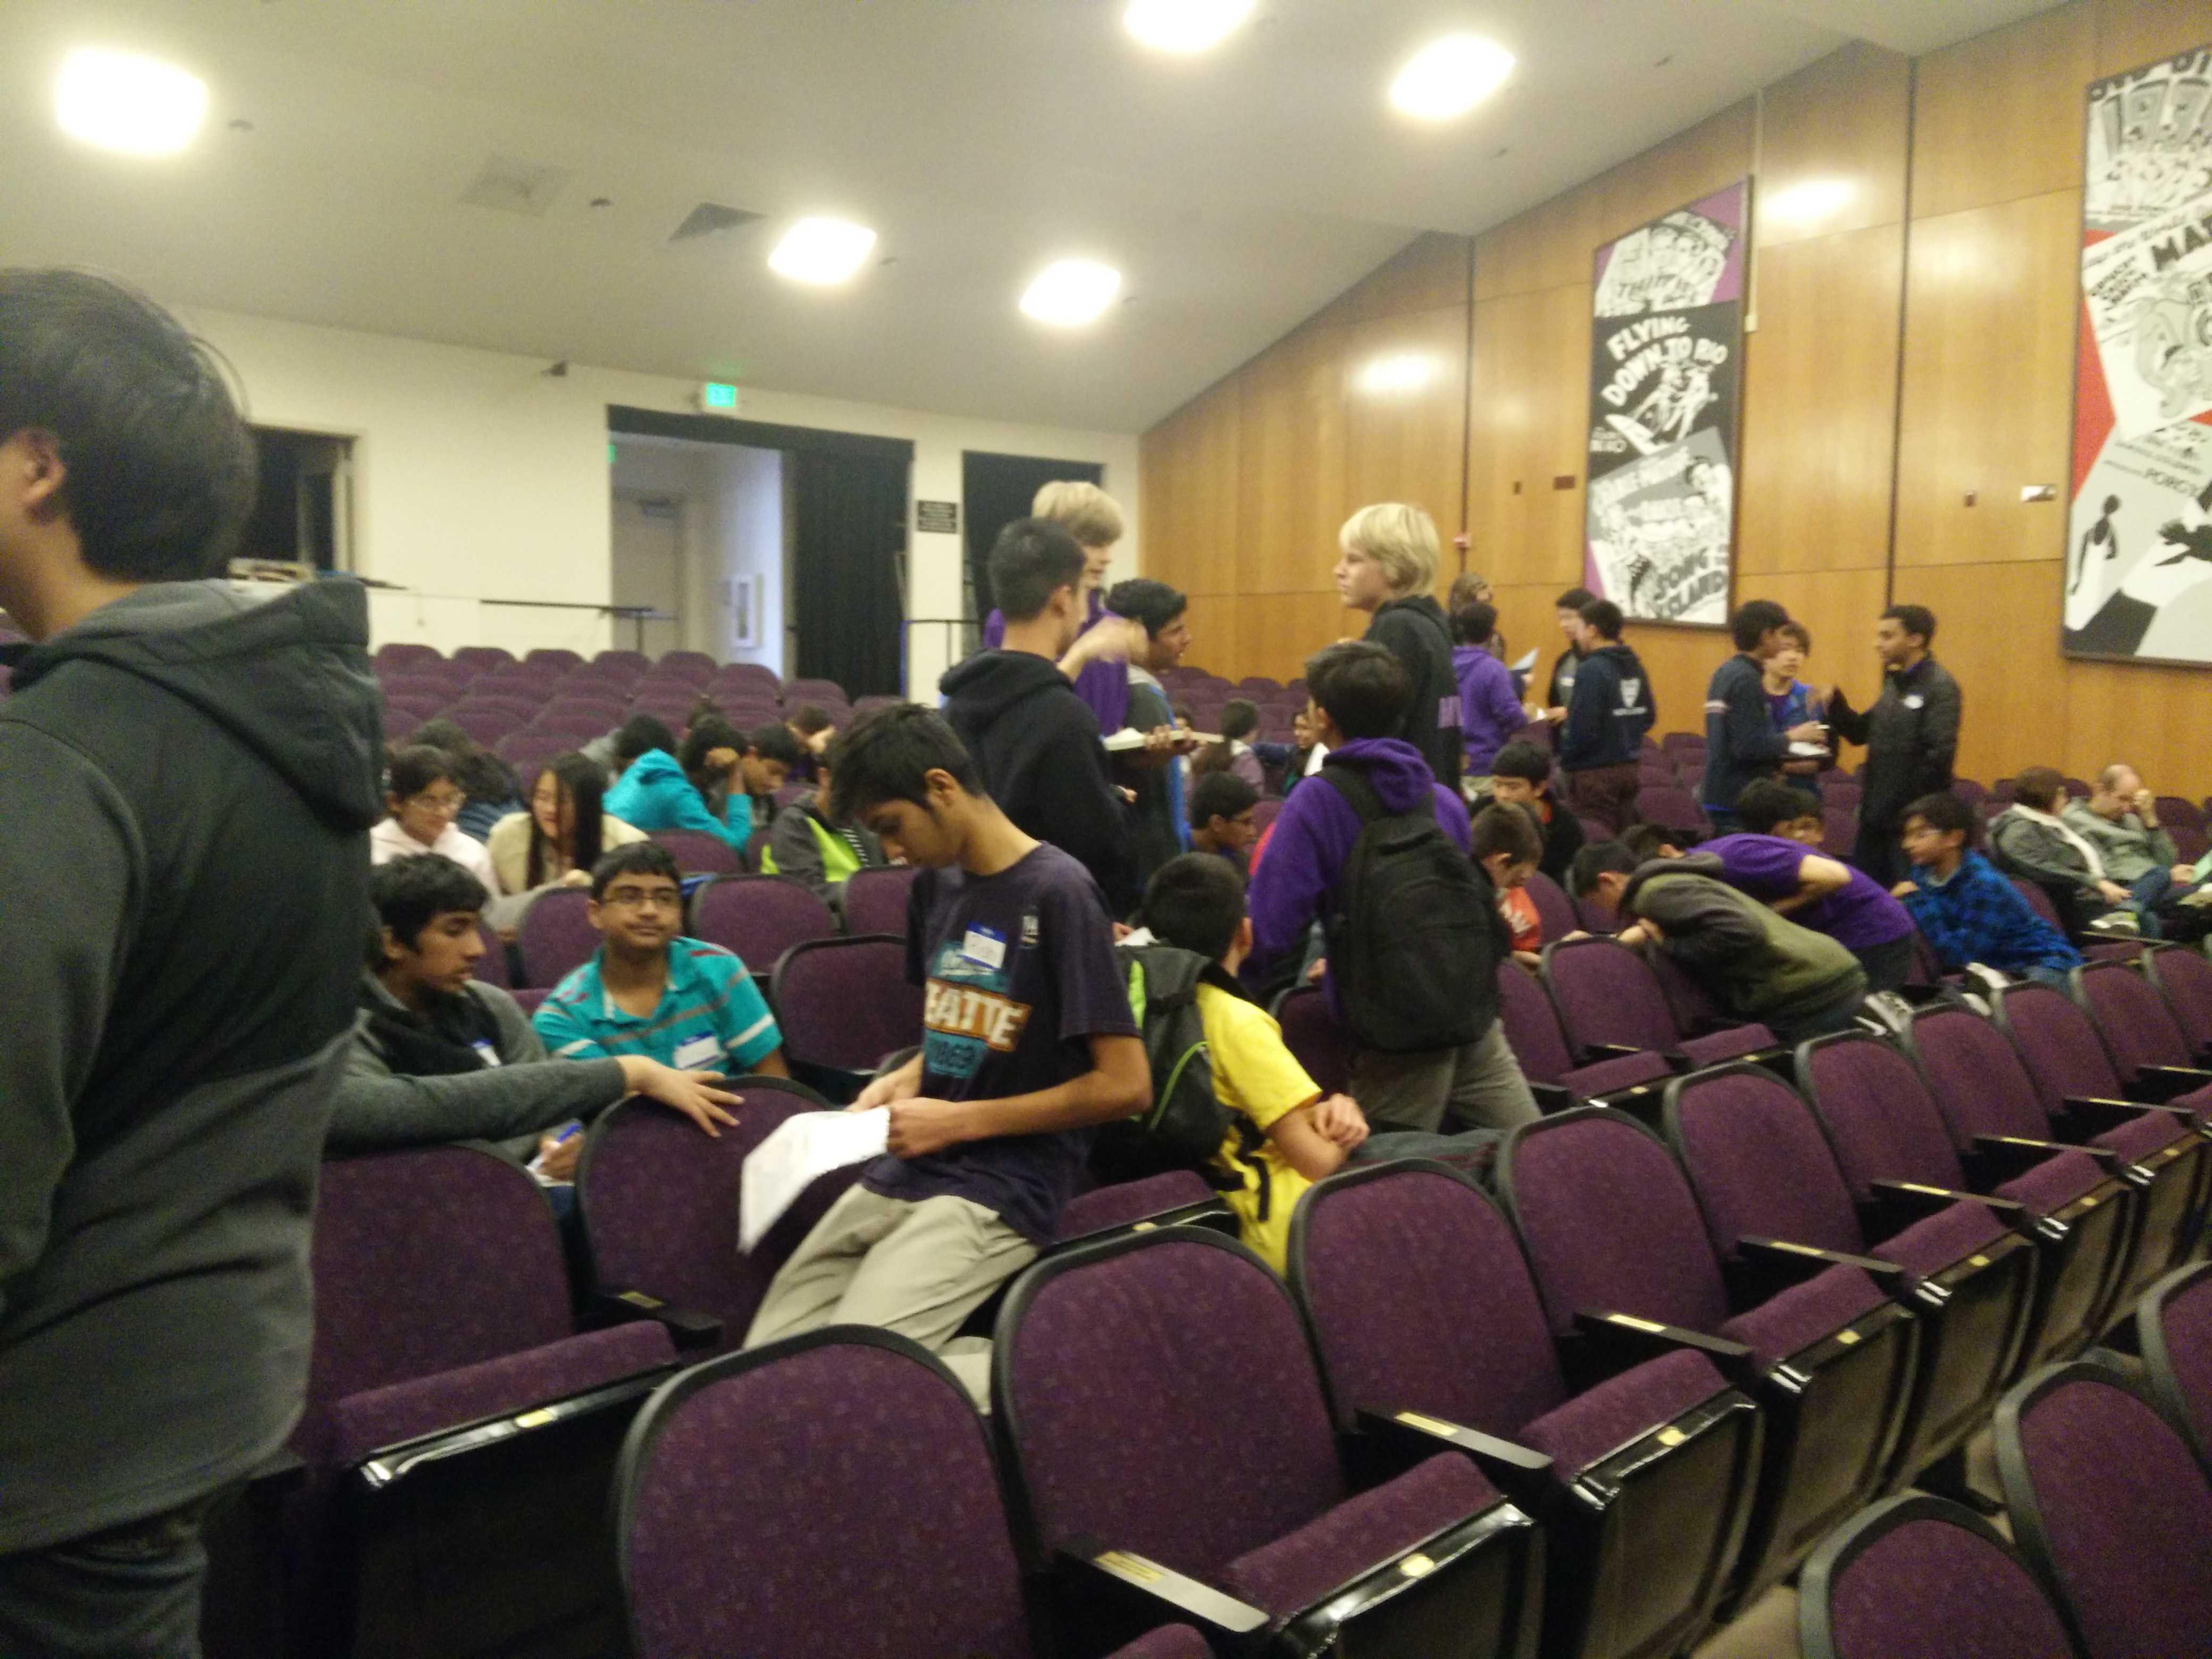 Robotics team members exchange strategies in small groups in the auditorium.